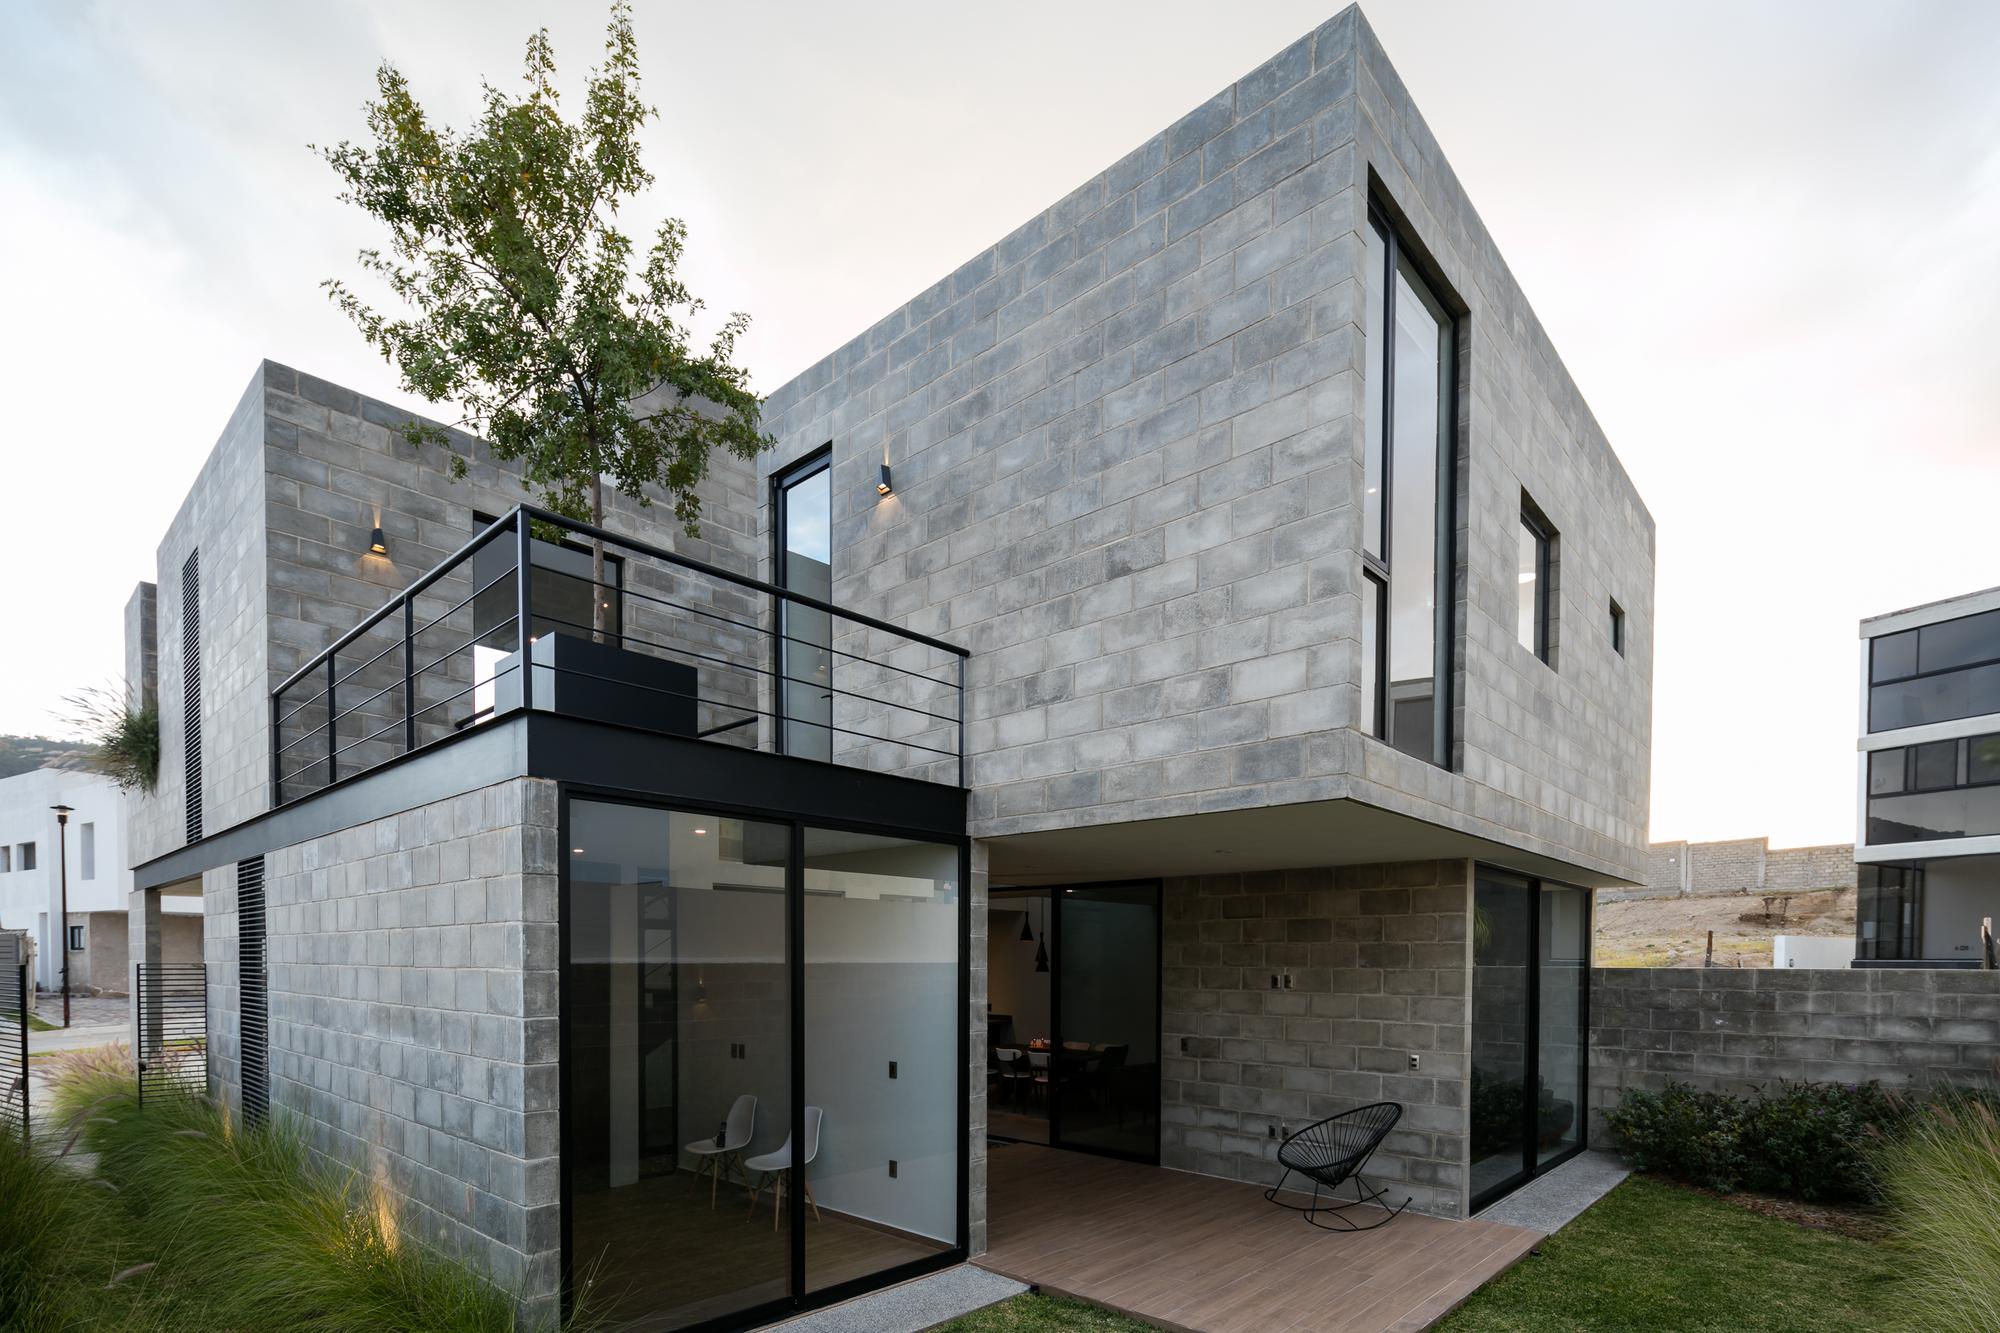 Galer a de casa robles atier arquitectura 5 for Casas de ladrillo visto fotos